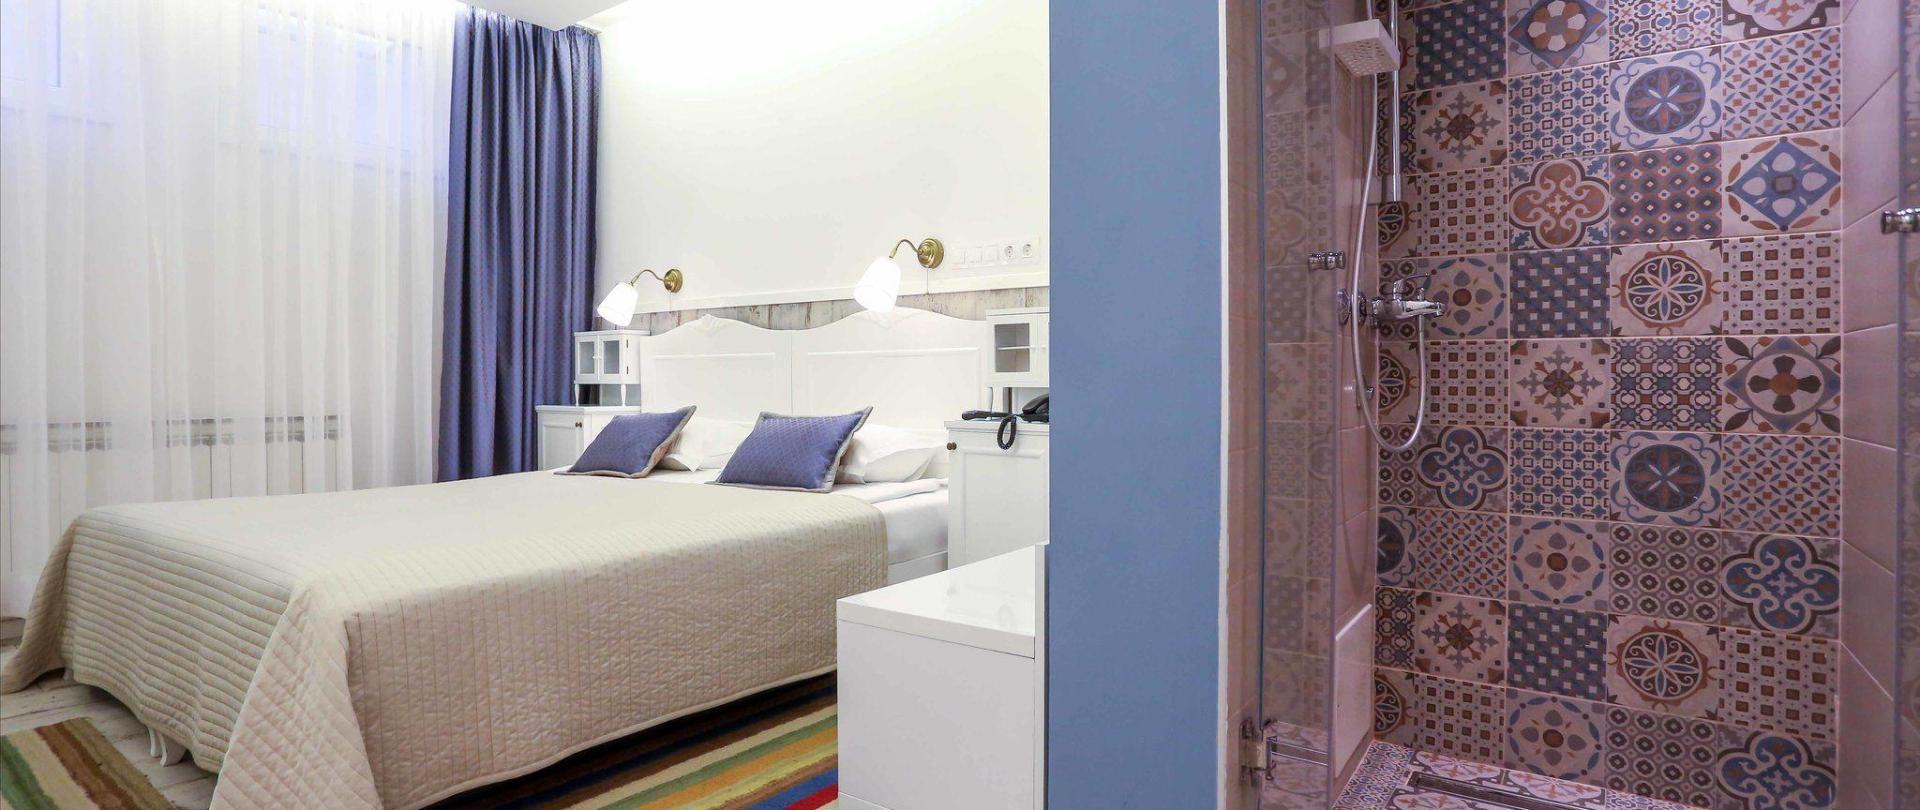 hotel-divan-by-dzenat-drekovic-29-08-2016-16.jpg